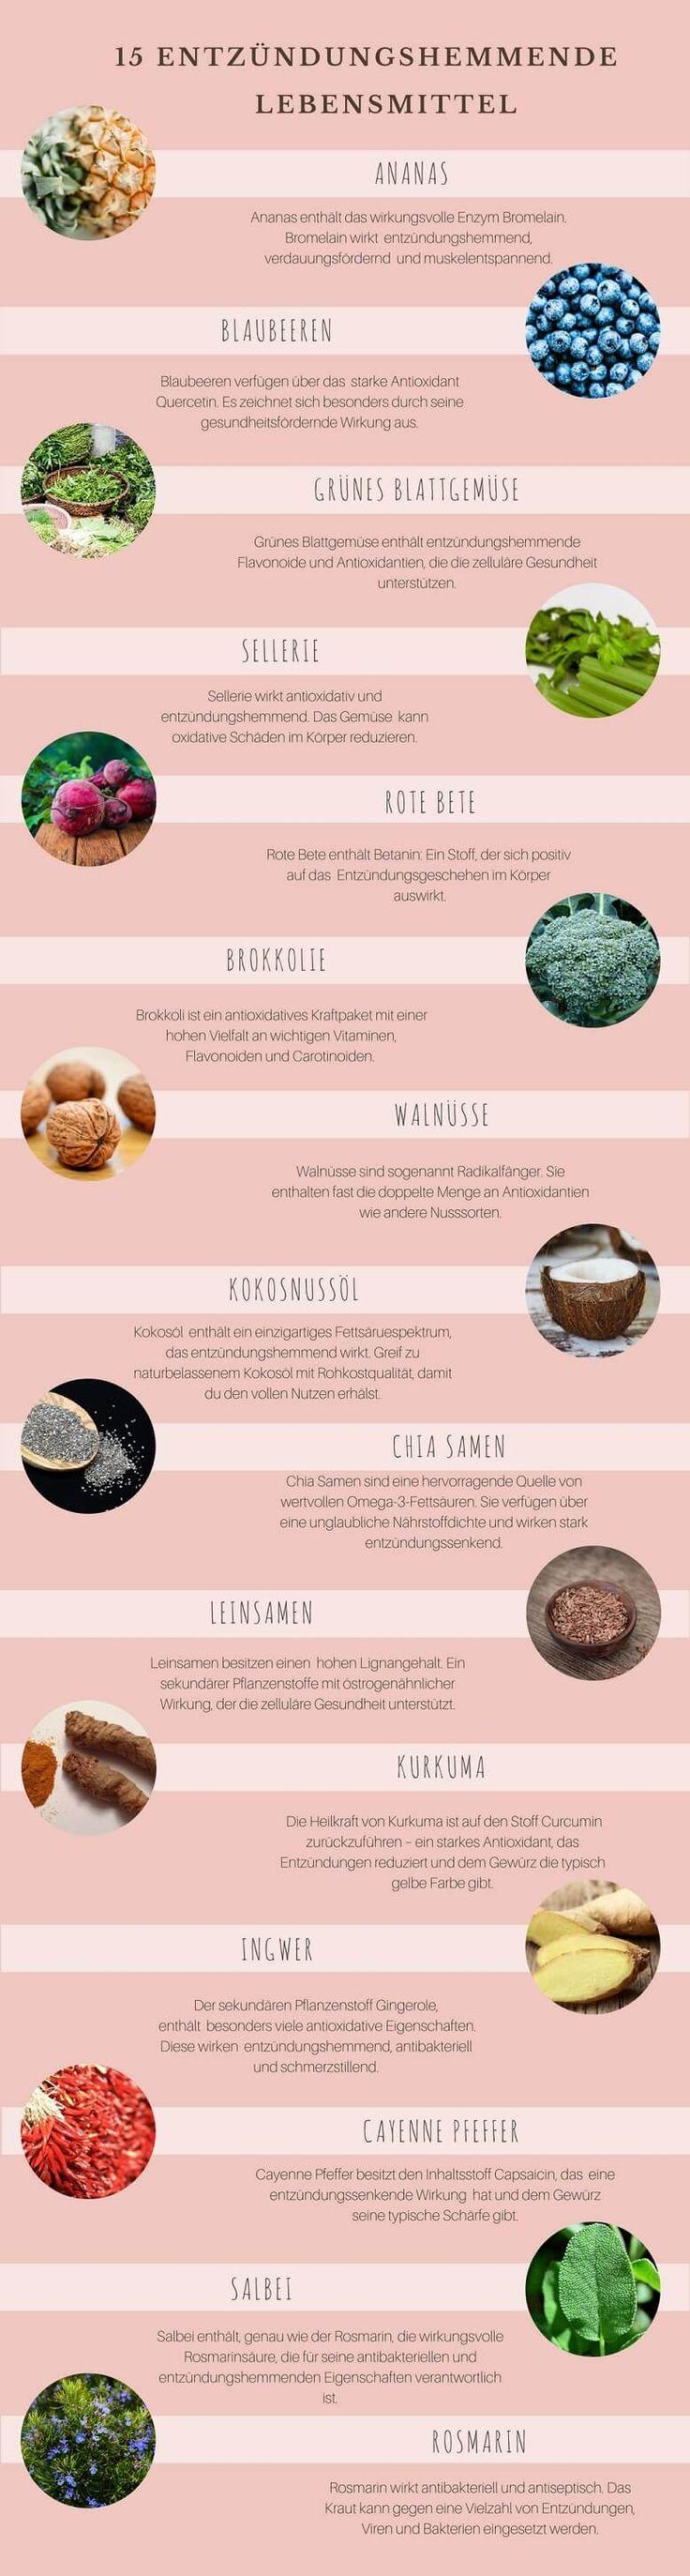 Tabelle entzündungshemmende Lebensmittel